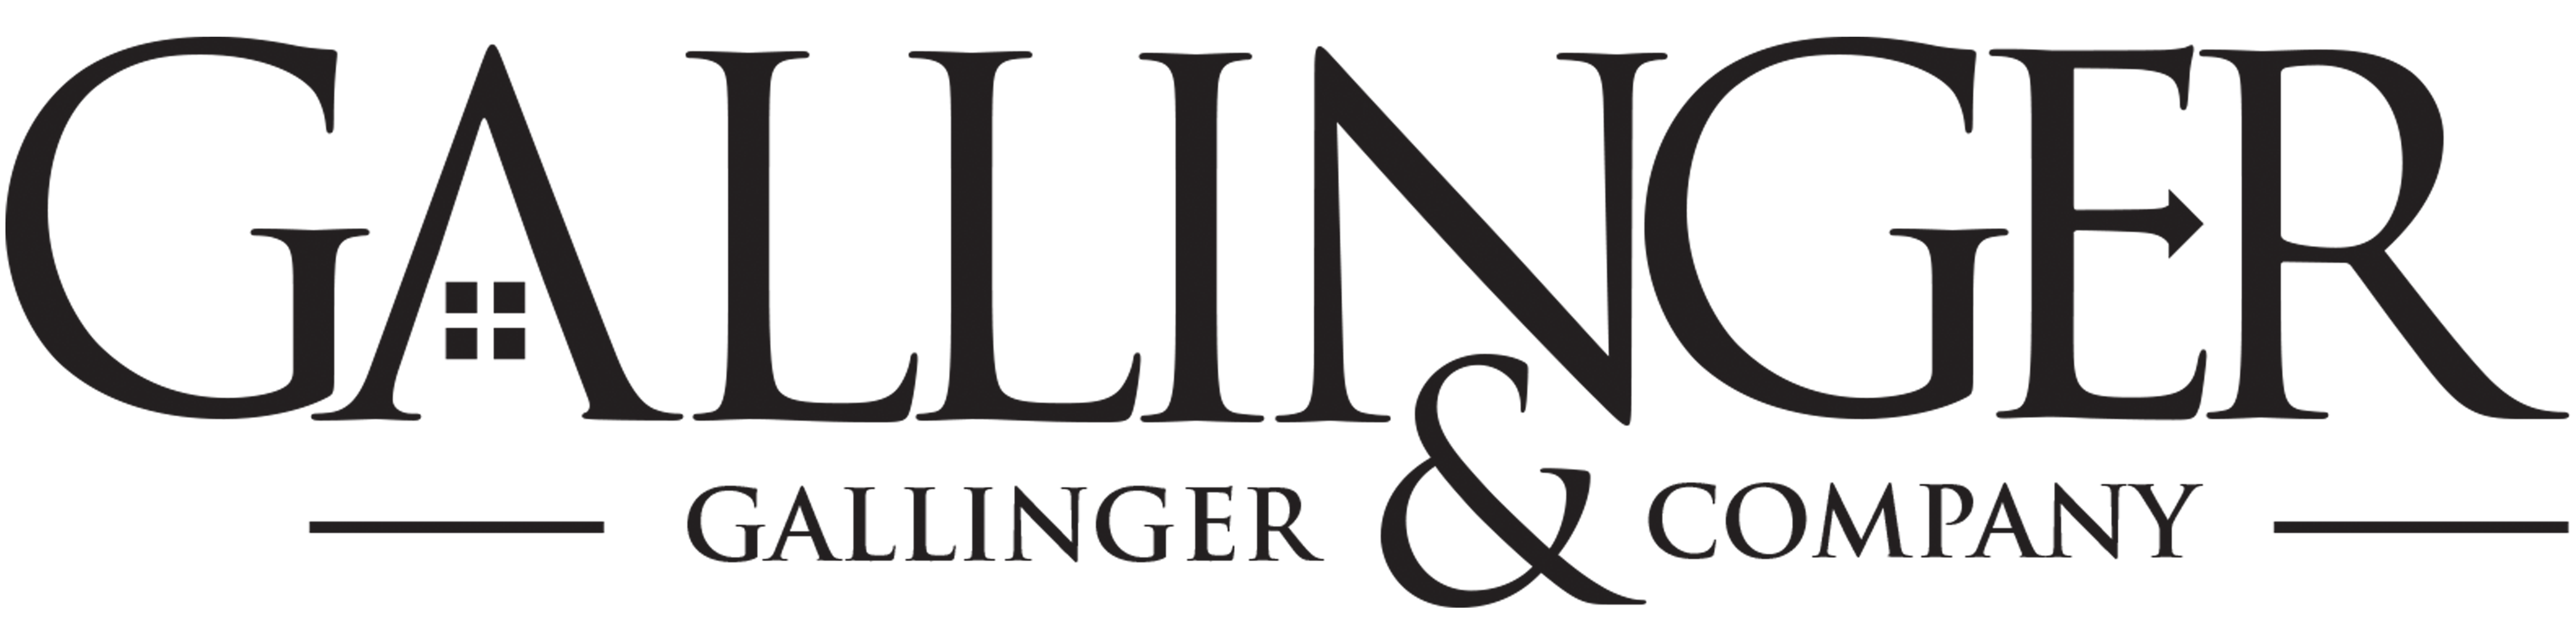 Gallinger & Company